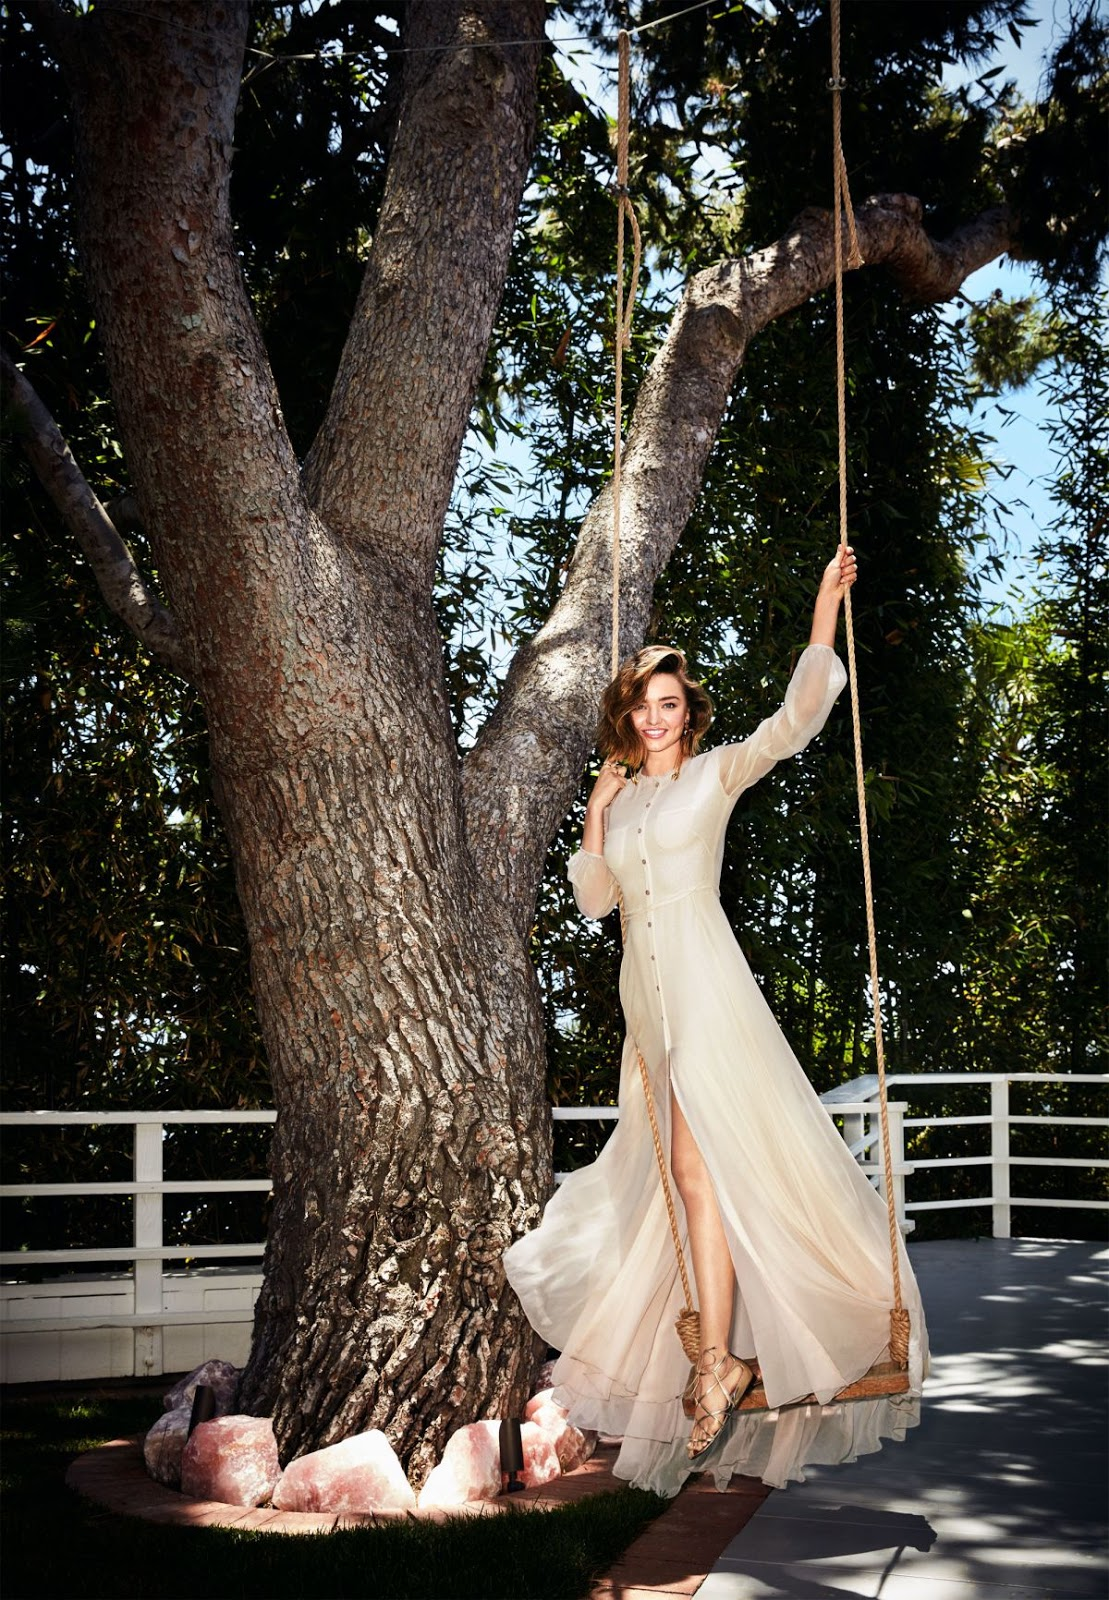 Full HD Photos & Wallpapers: Miranda Kerr By Douglas Friedman Photoshoot